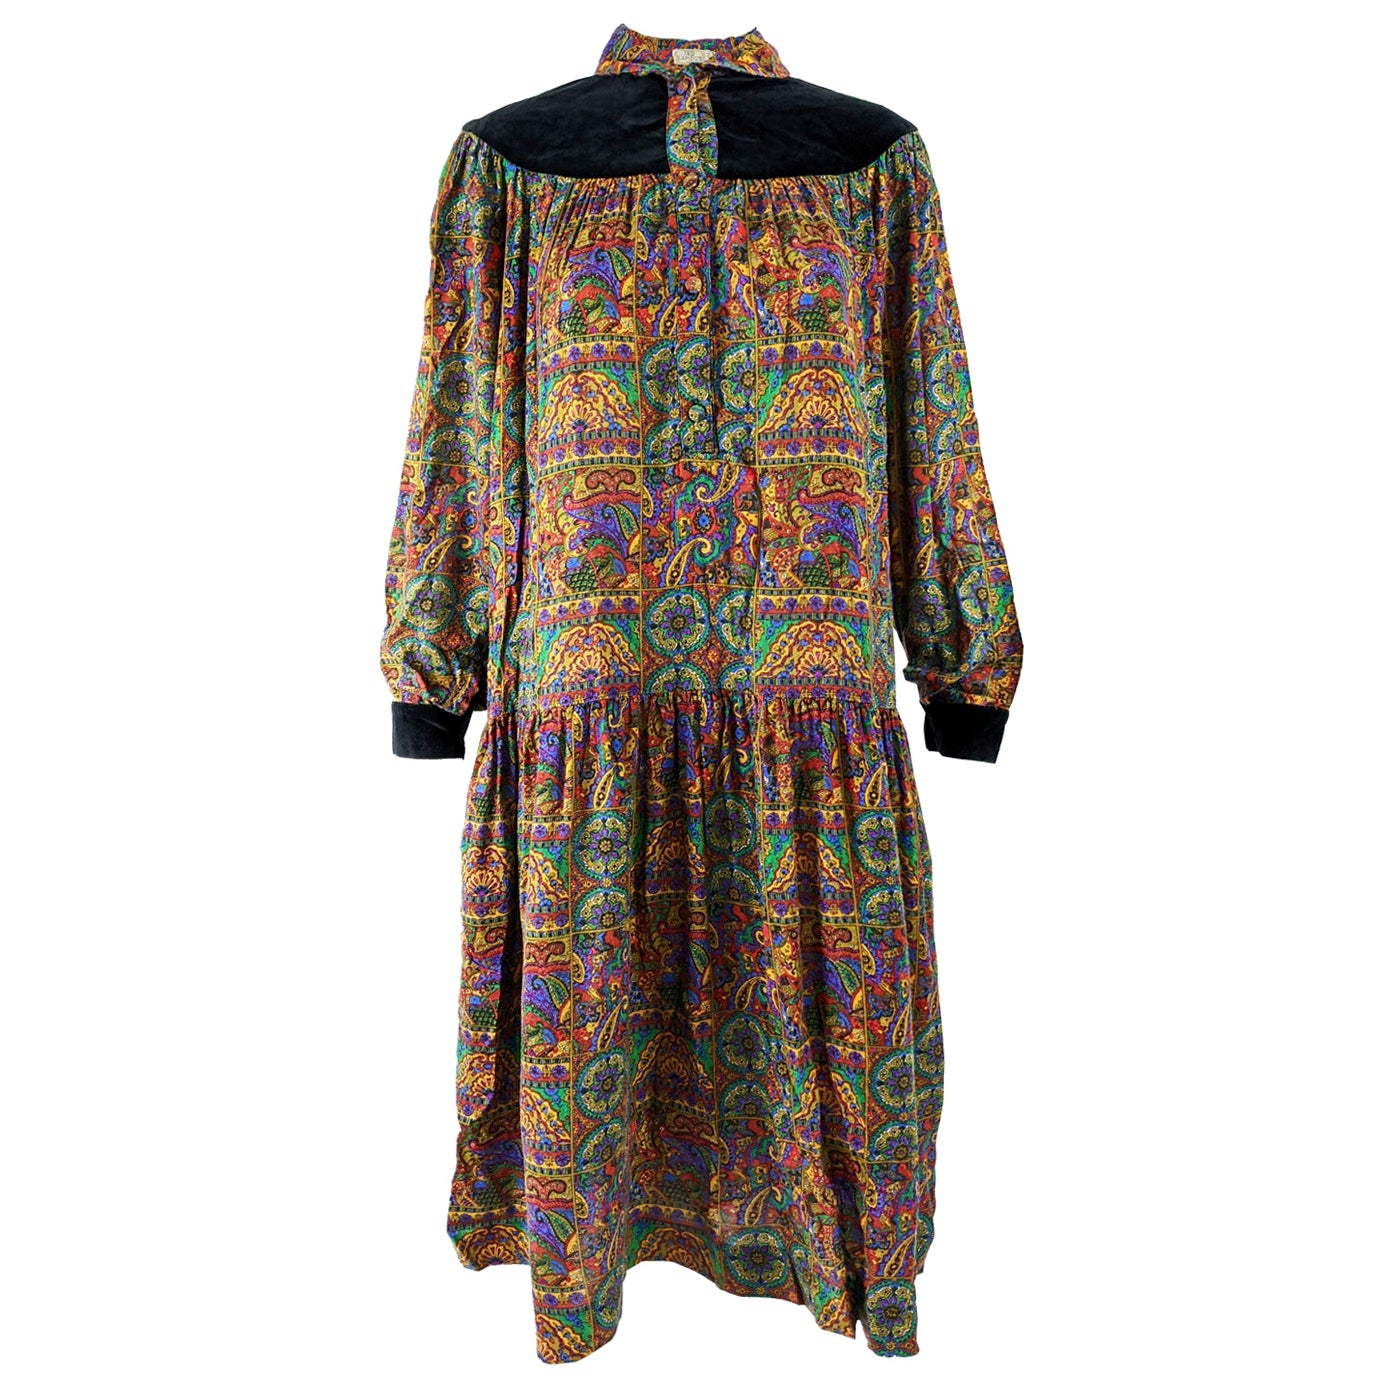 Ted Lapidus Vintage Paisley Oversized Smock Dress, 1970s